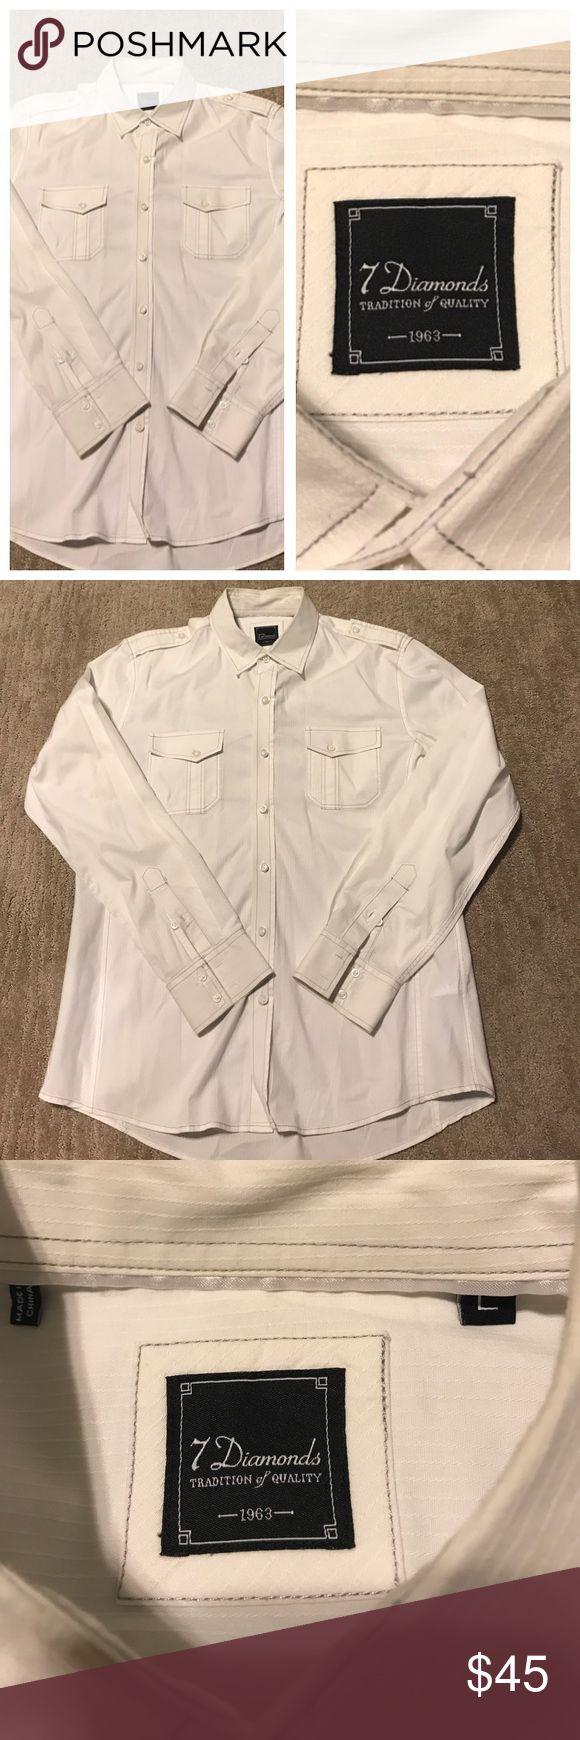 Men's 7 Diamonds Button-Up Shirt Great condition, hardly worn! Men's 7 Diamonds Shirt. Size large 7 Diamonds Shirts Dress Shirts